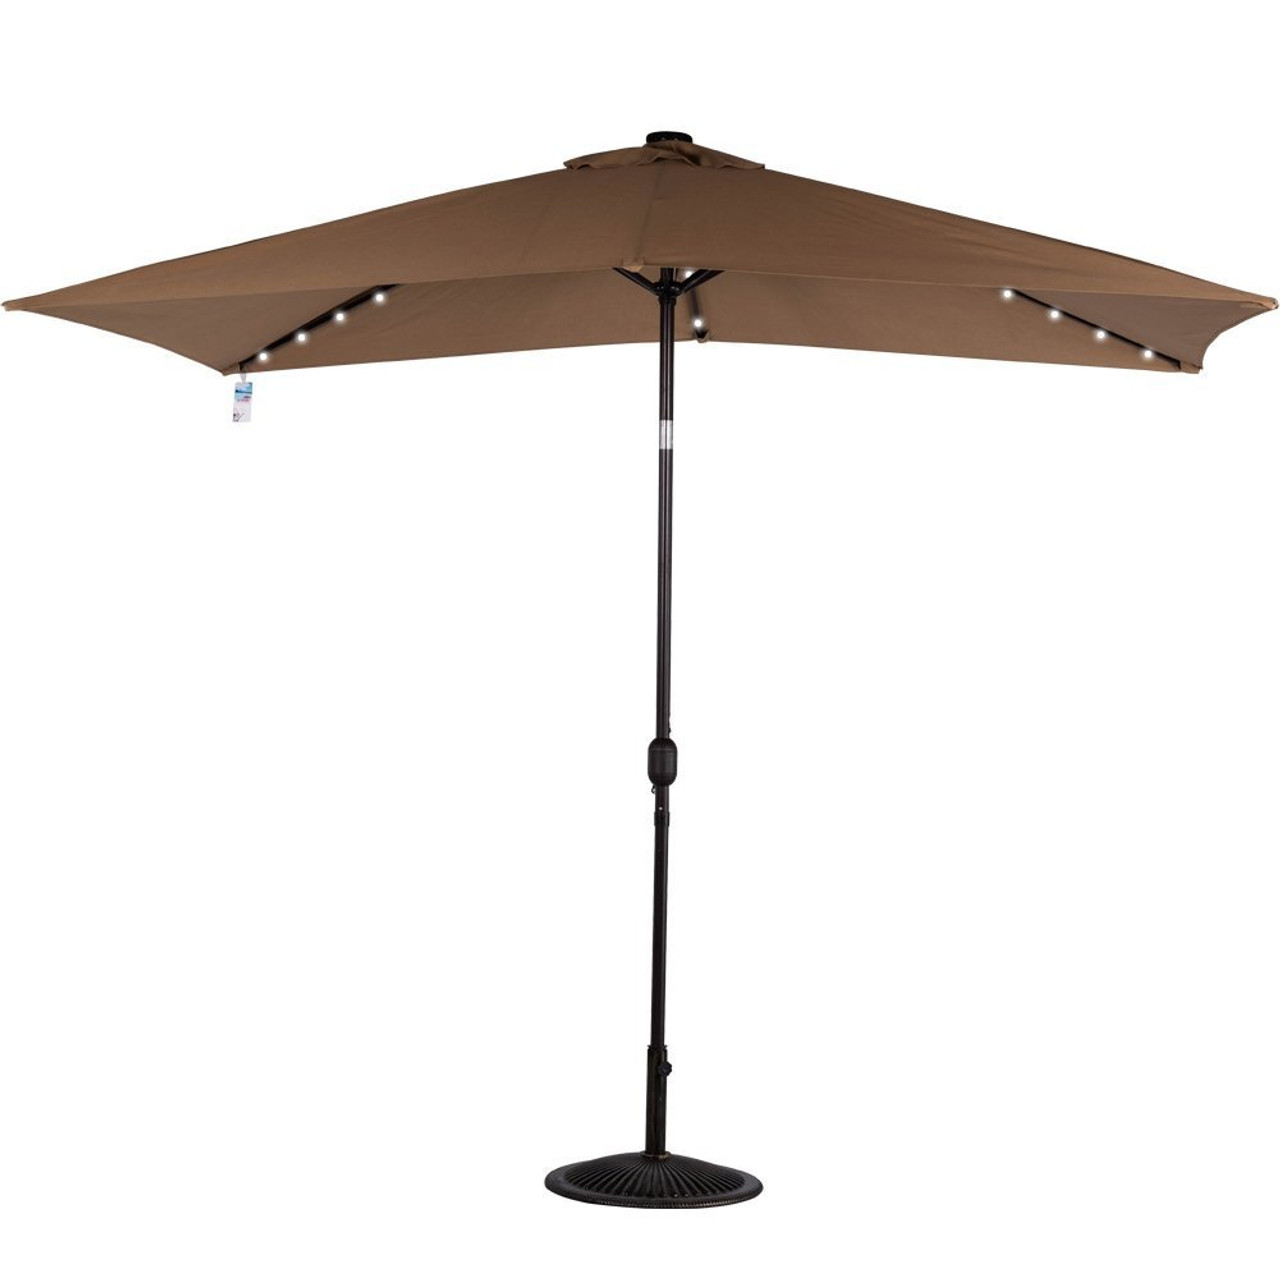 Rectangular Solar Powered 22 LED Lighted Outdoor Patio Umbrella(Tan)